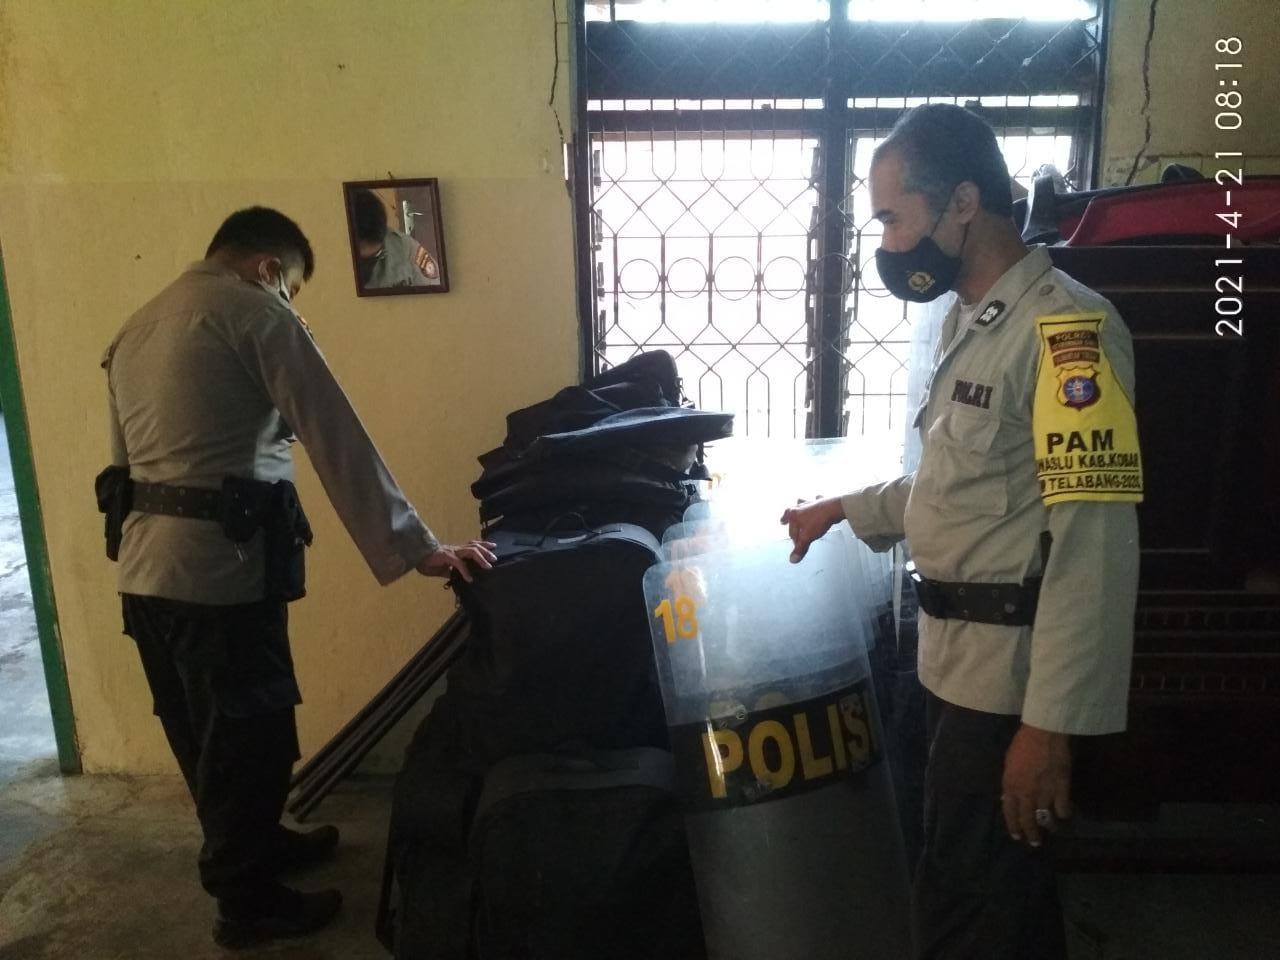 Anggota Satbinmas melaksanakan pengamanan di pospam kantor Bawaslu